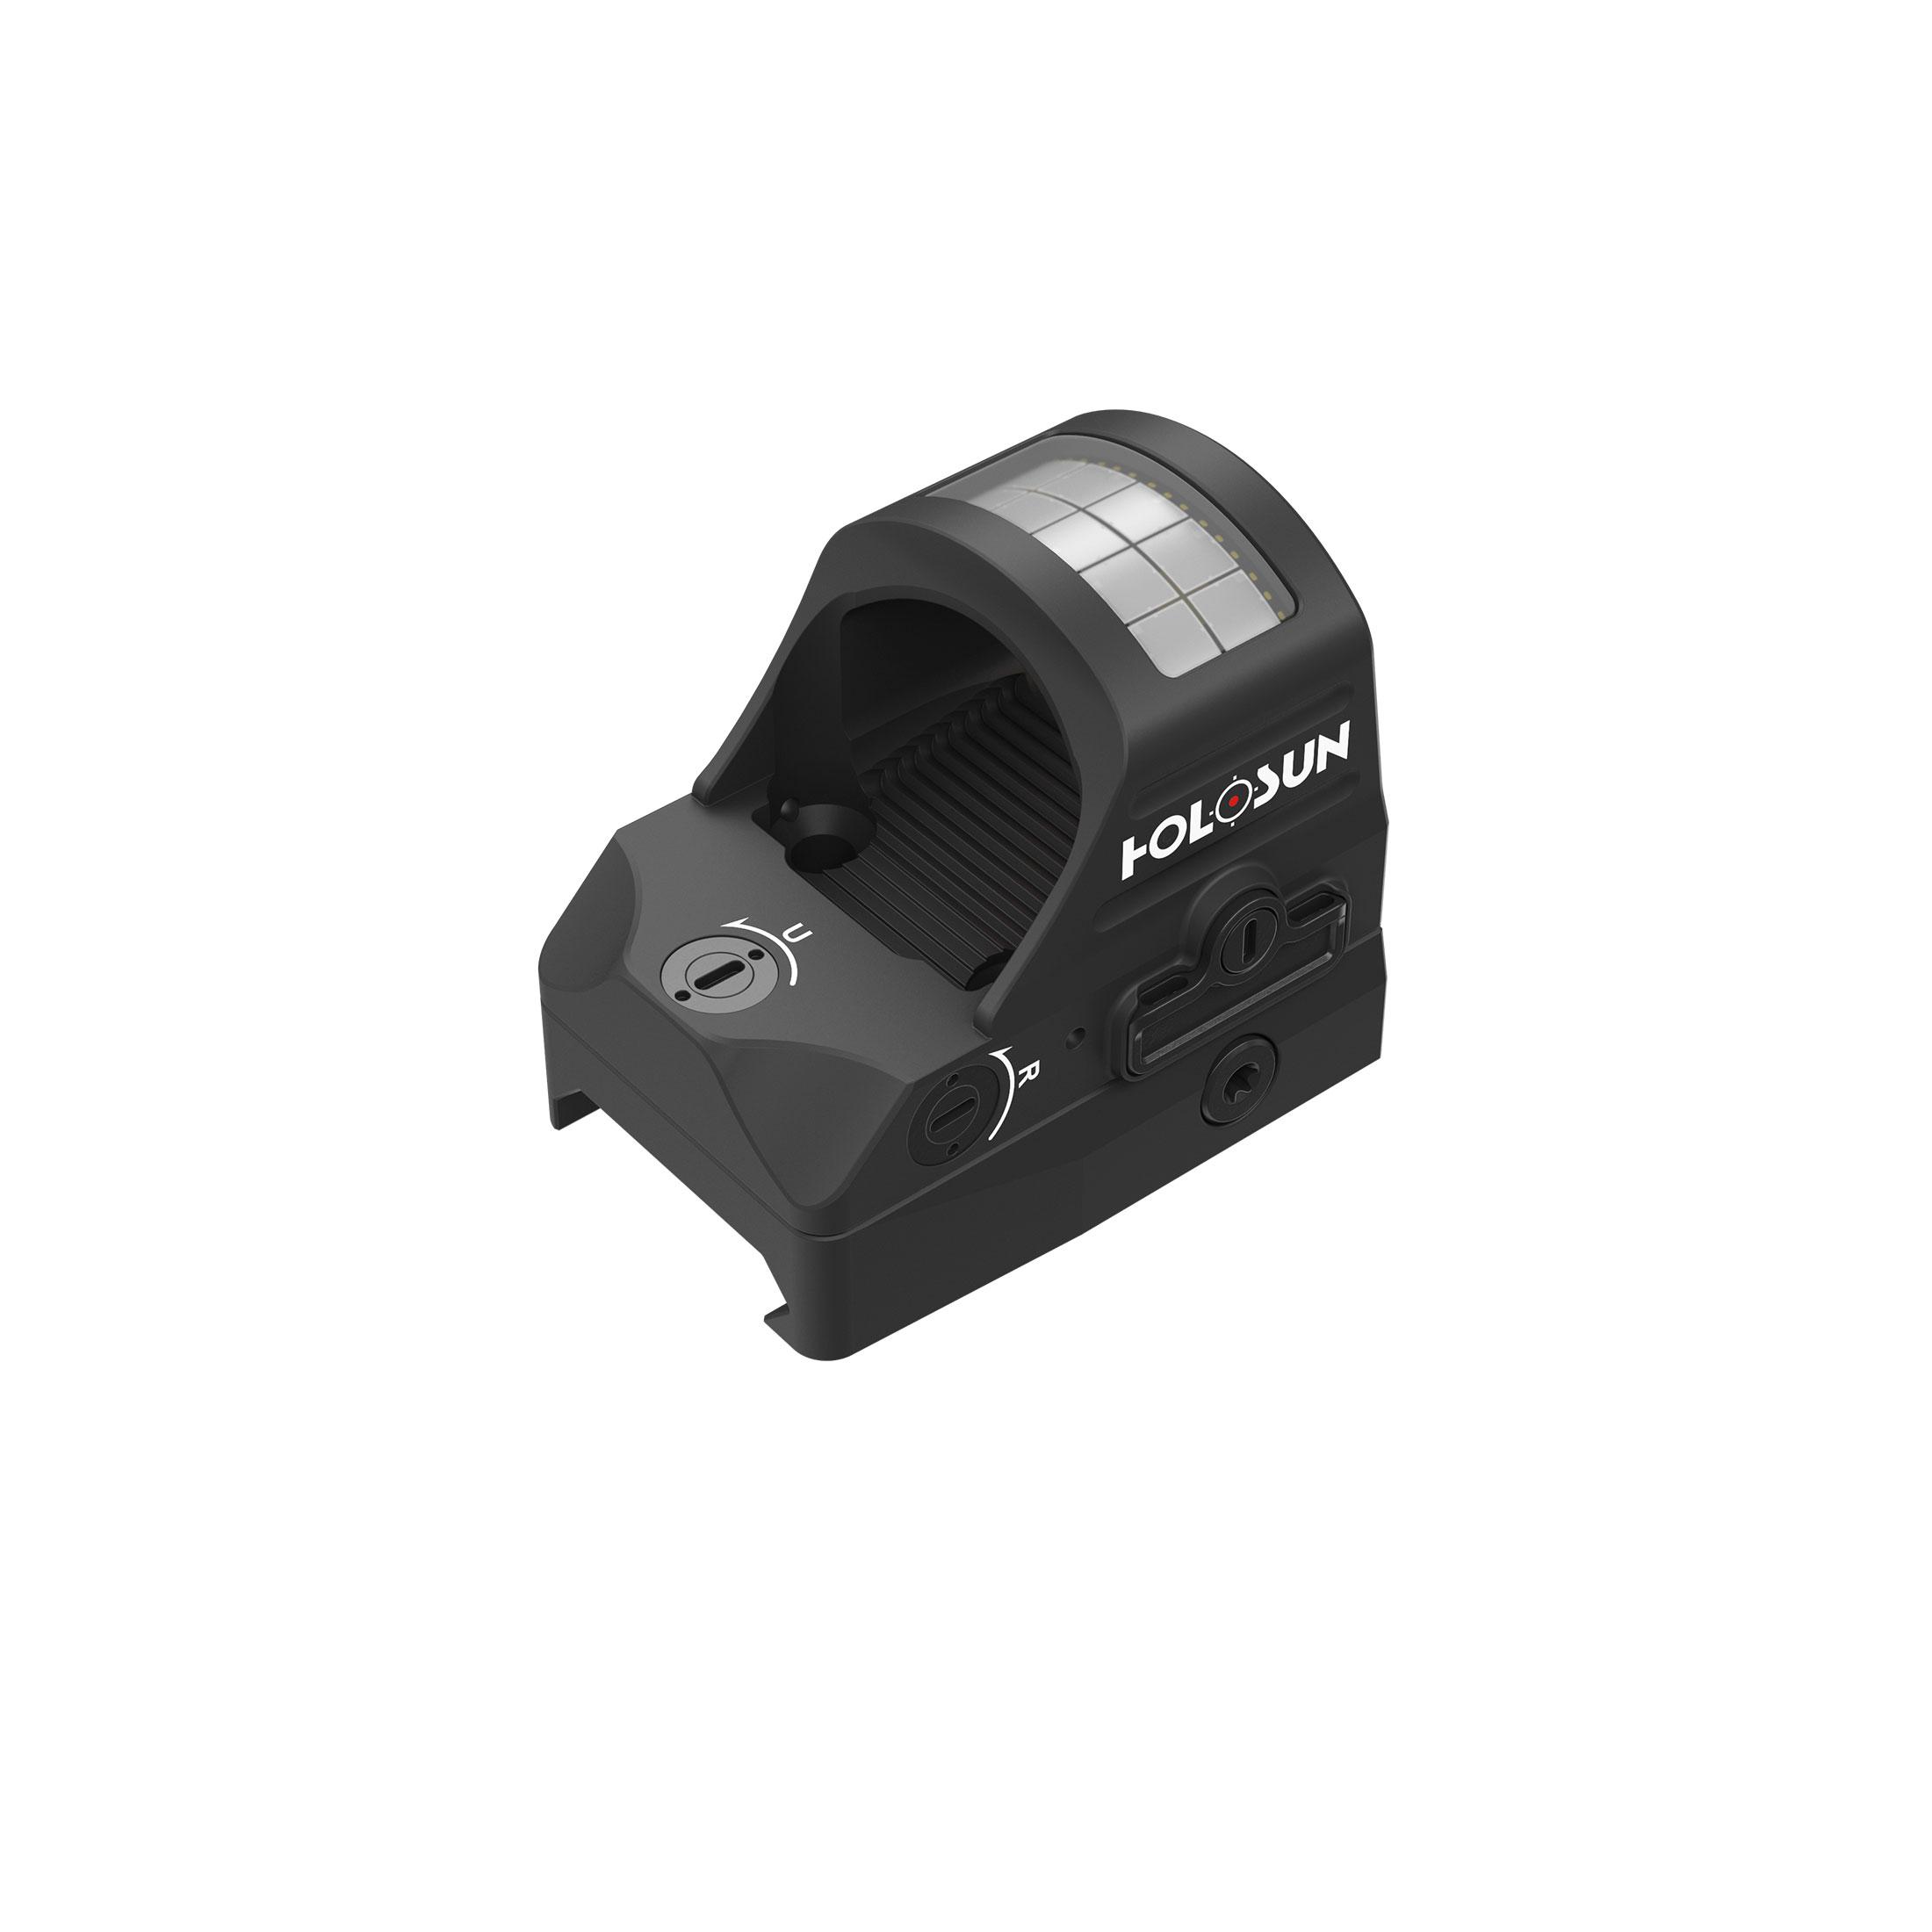 Holosun Dot Sight CLASSIC HS407C-X2-MOUNT